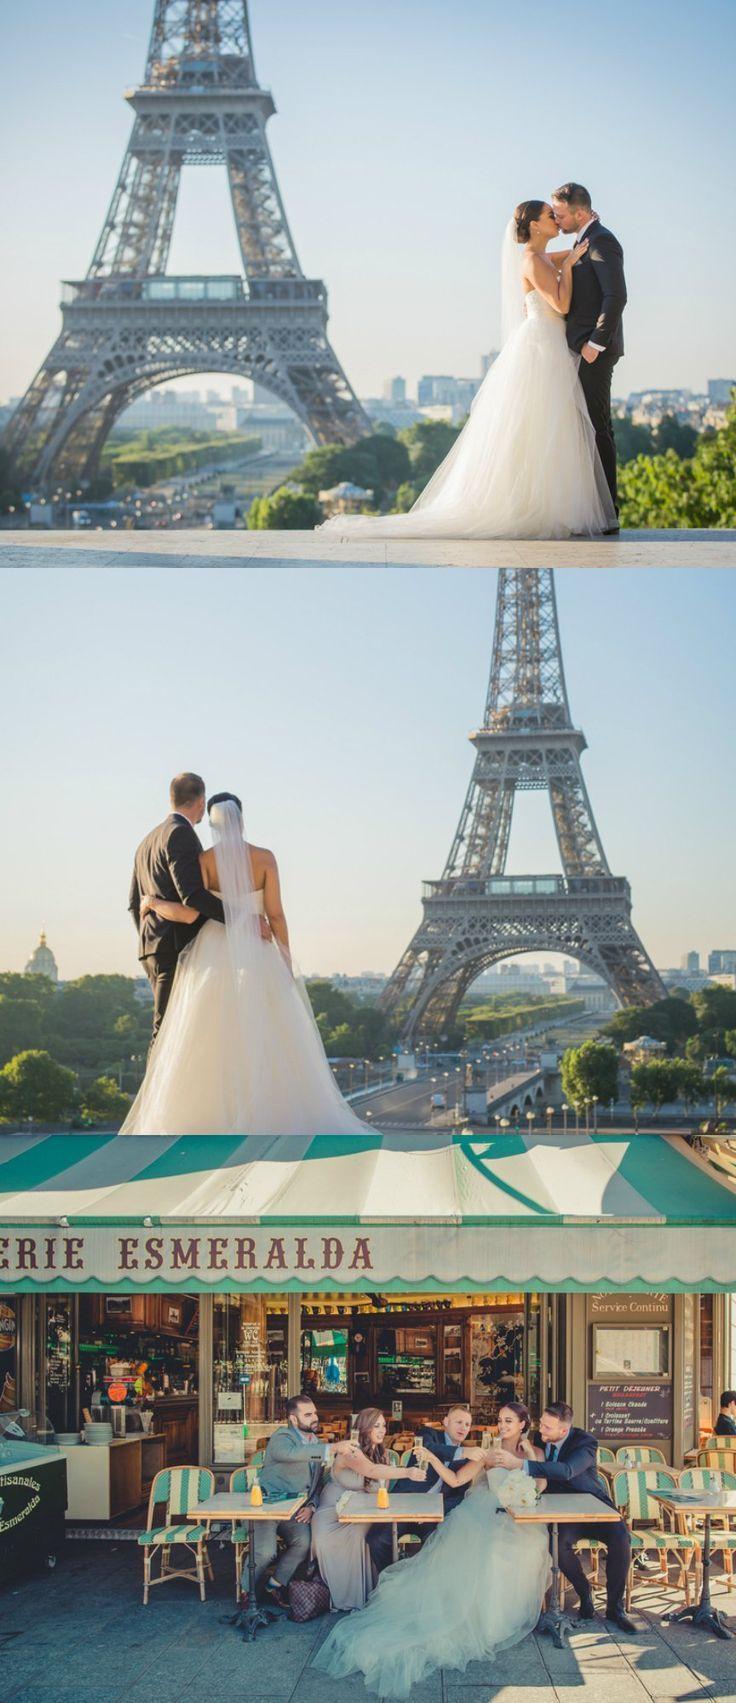 Hot Destinations for Weddings